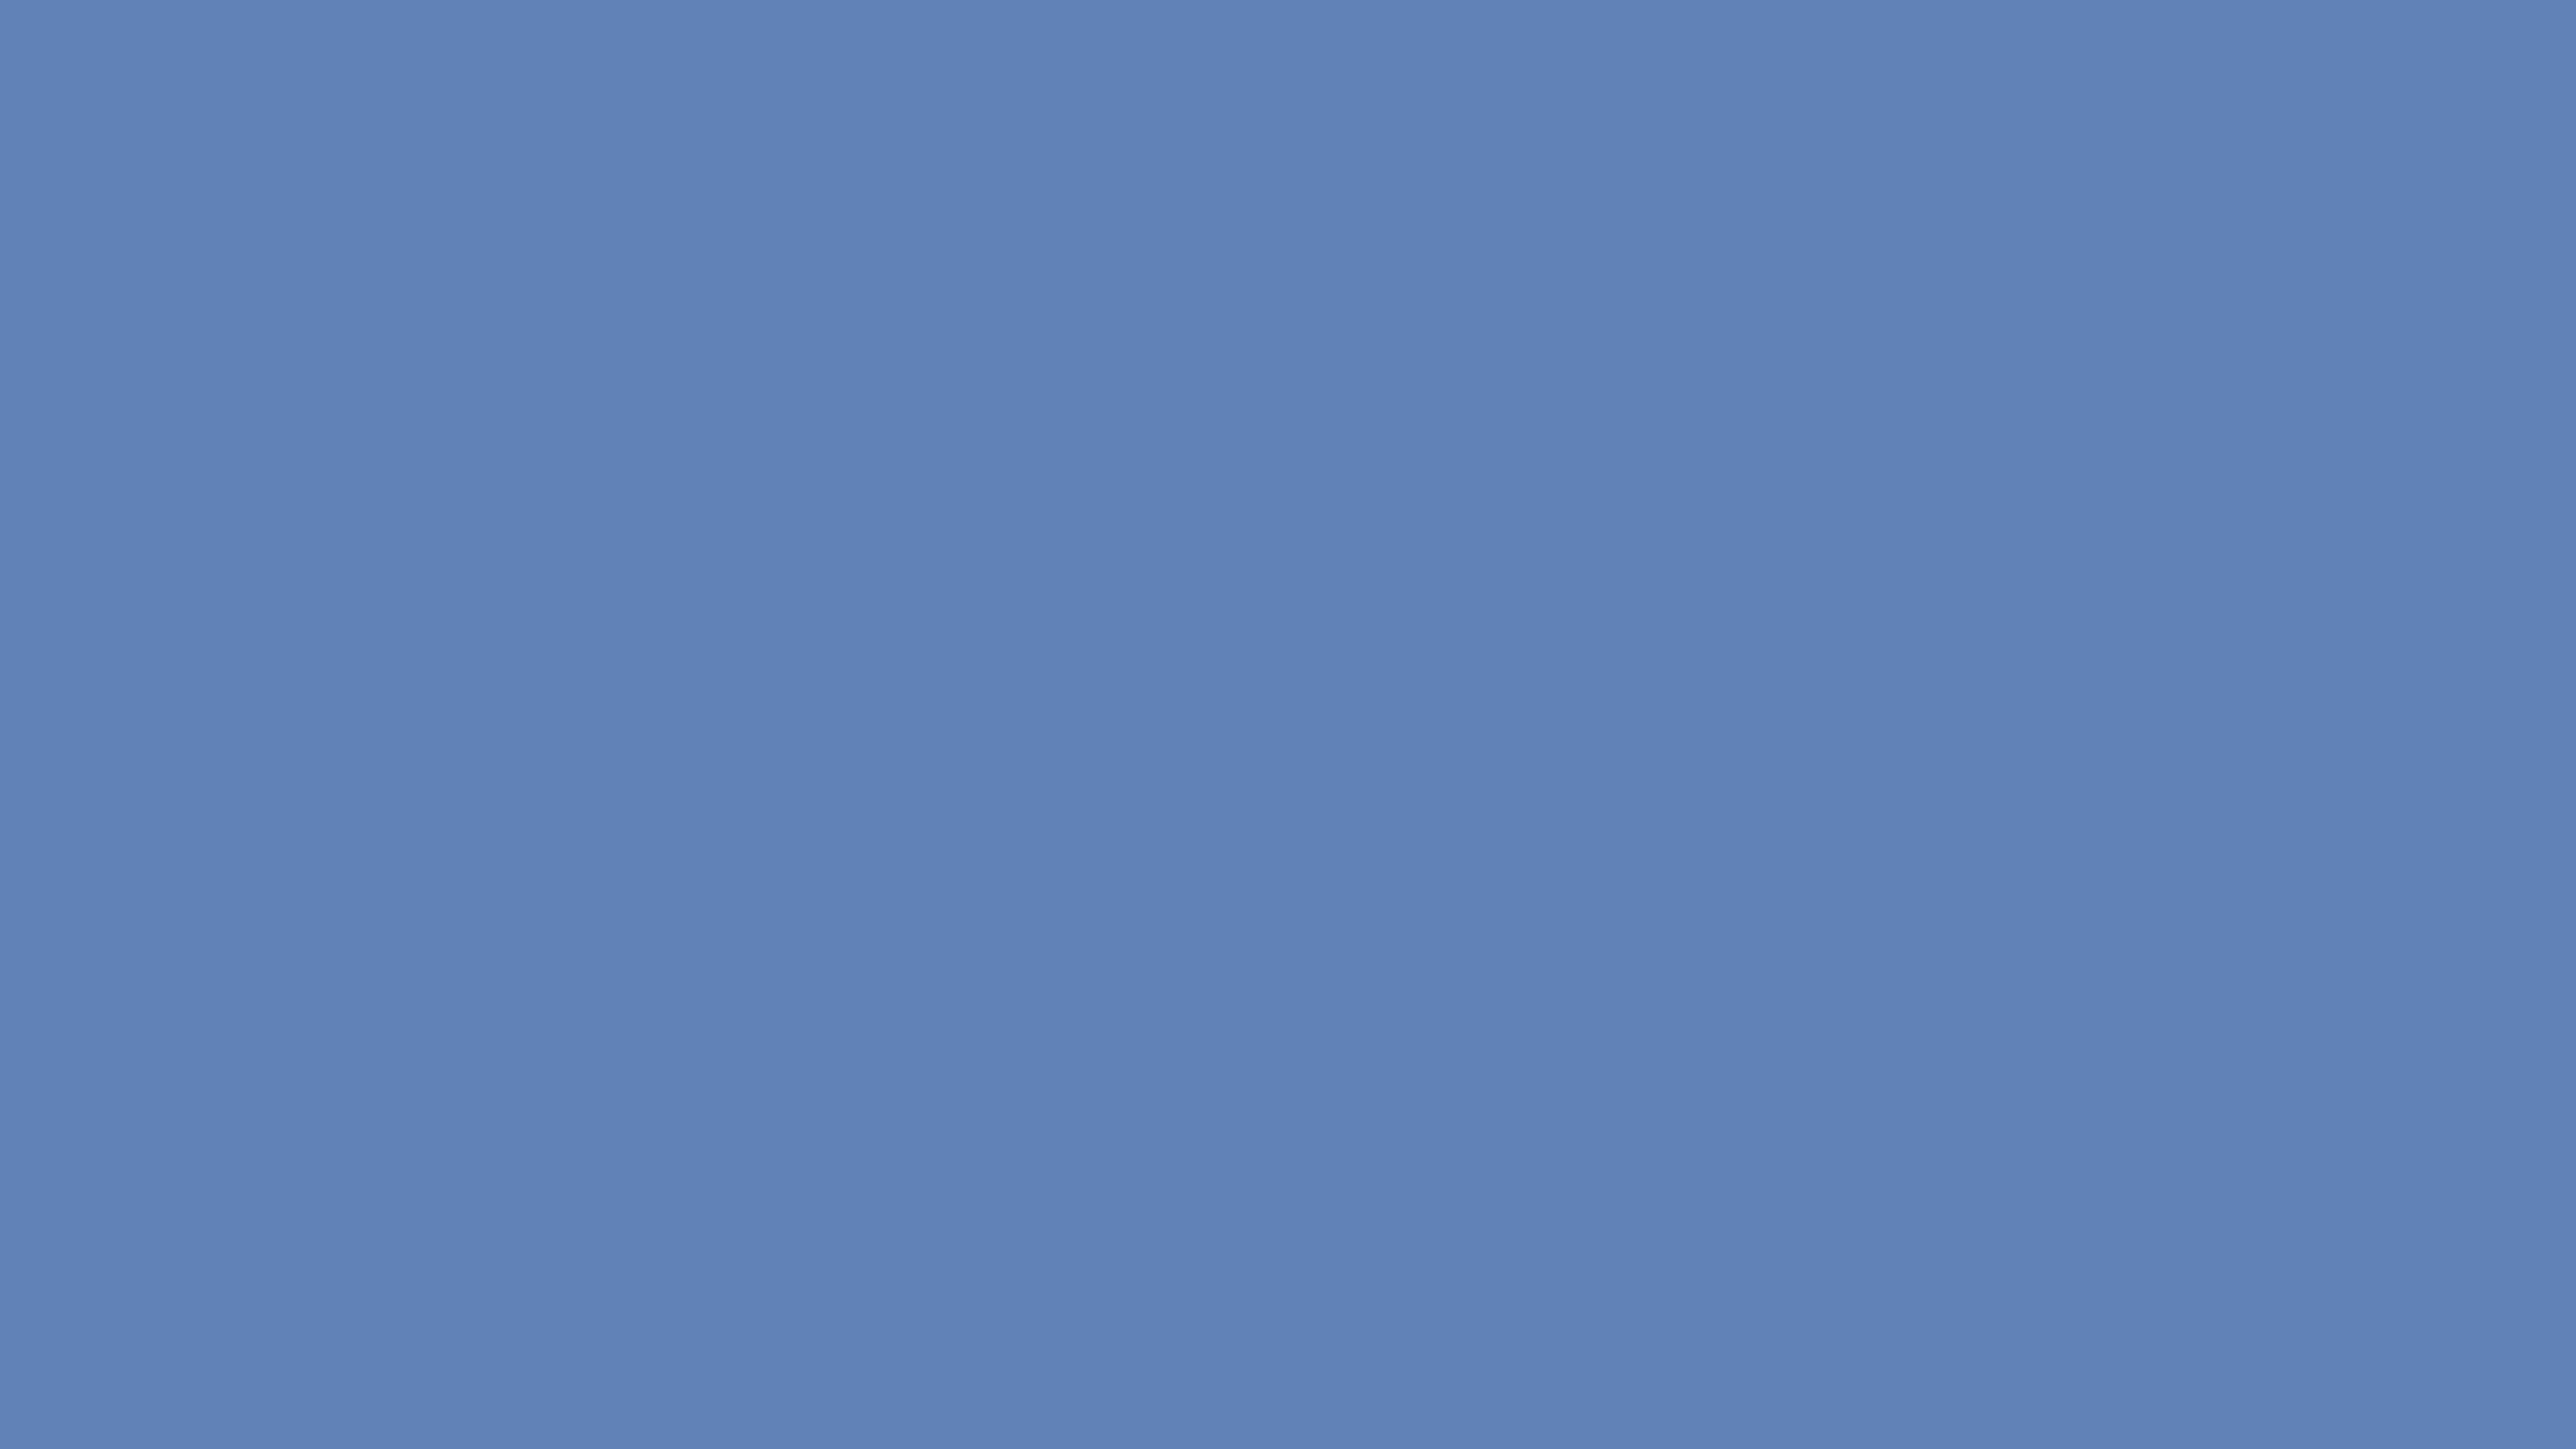 7680x4320 Glaucous Solid Color Background